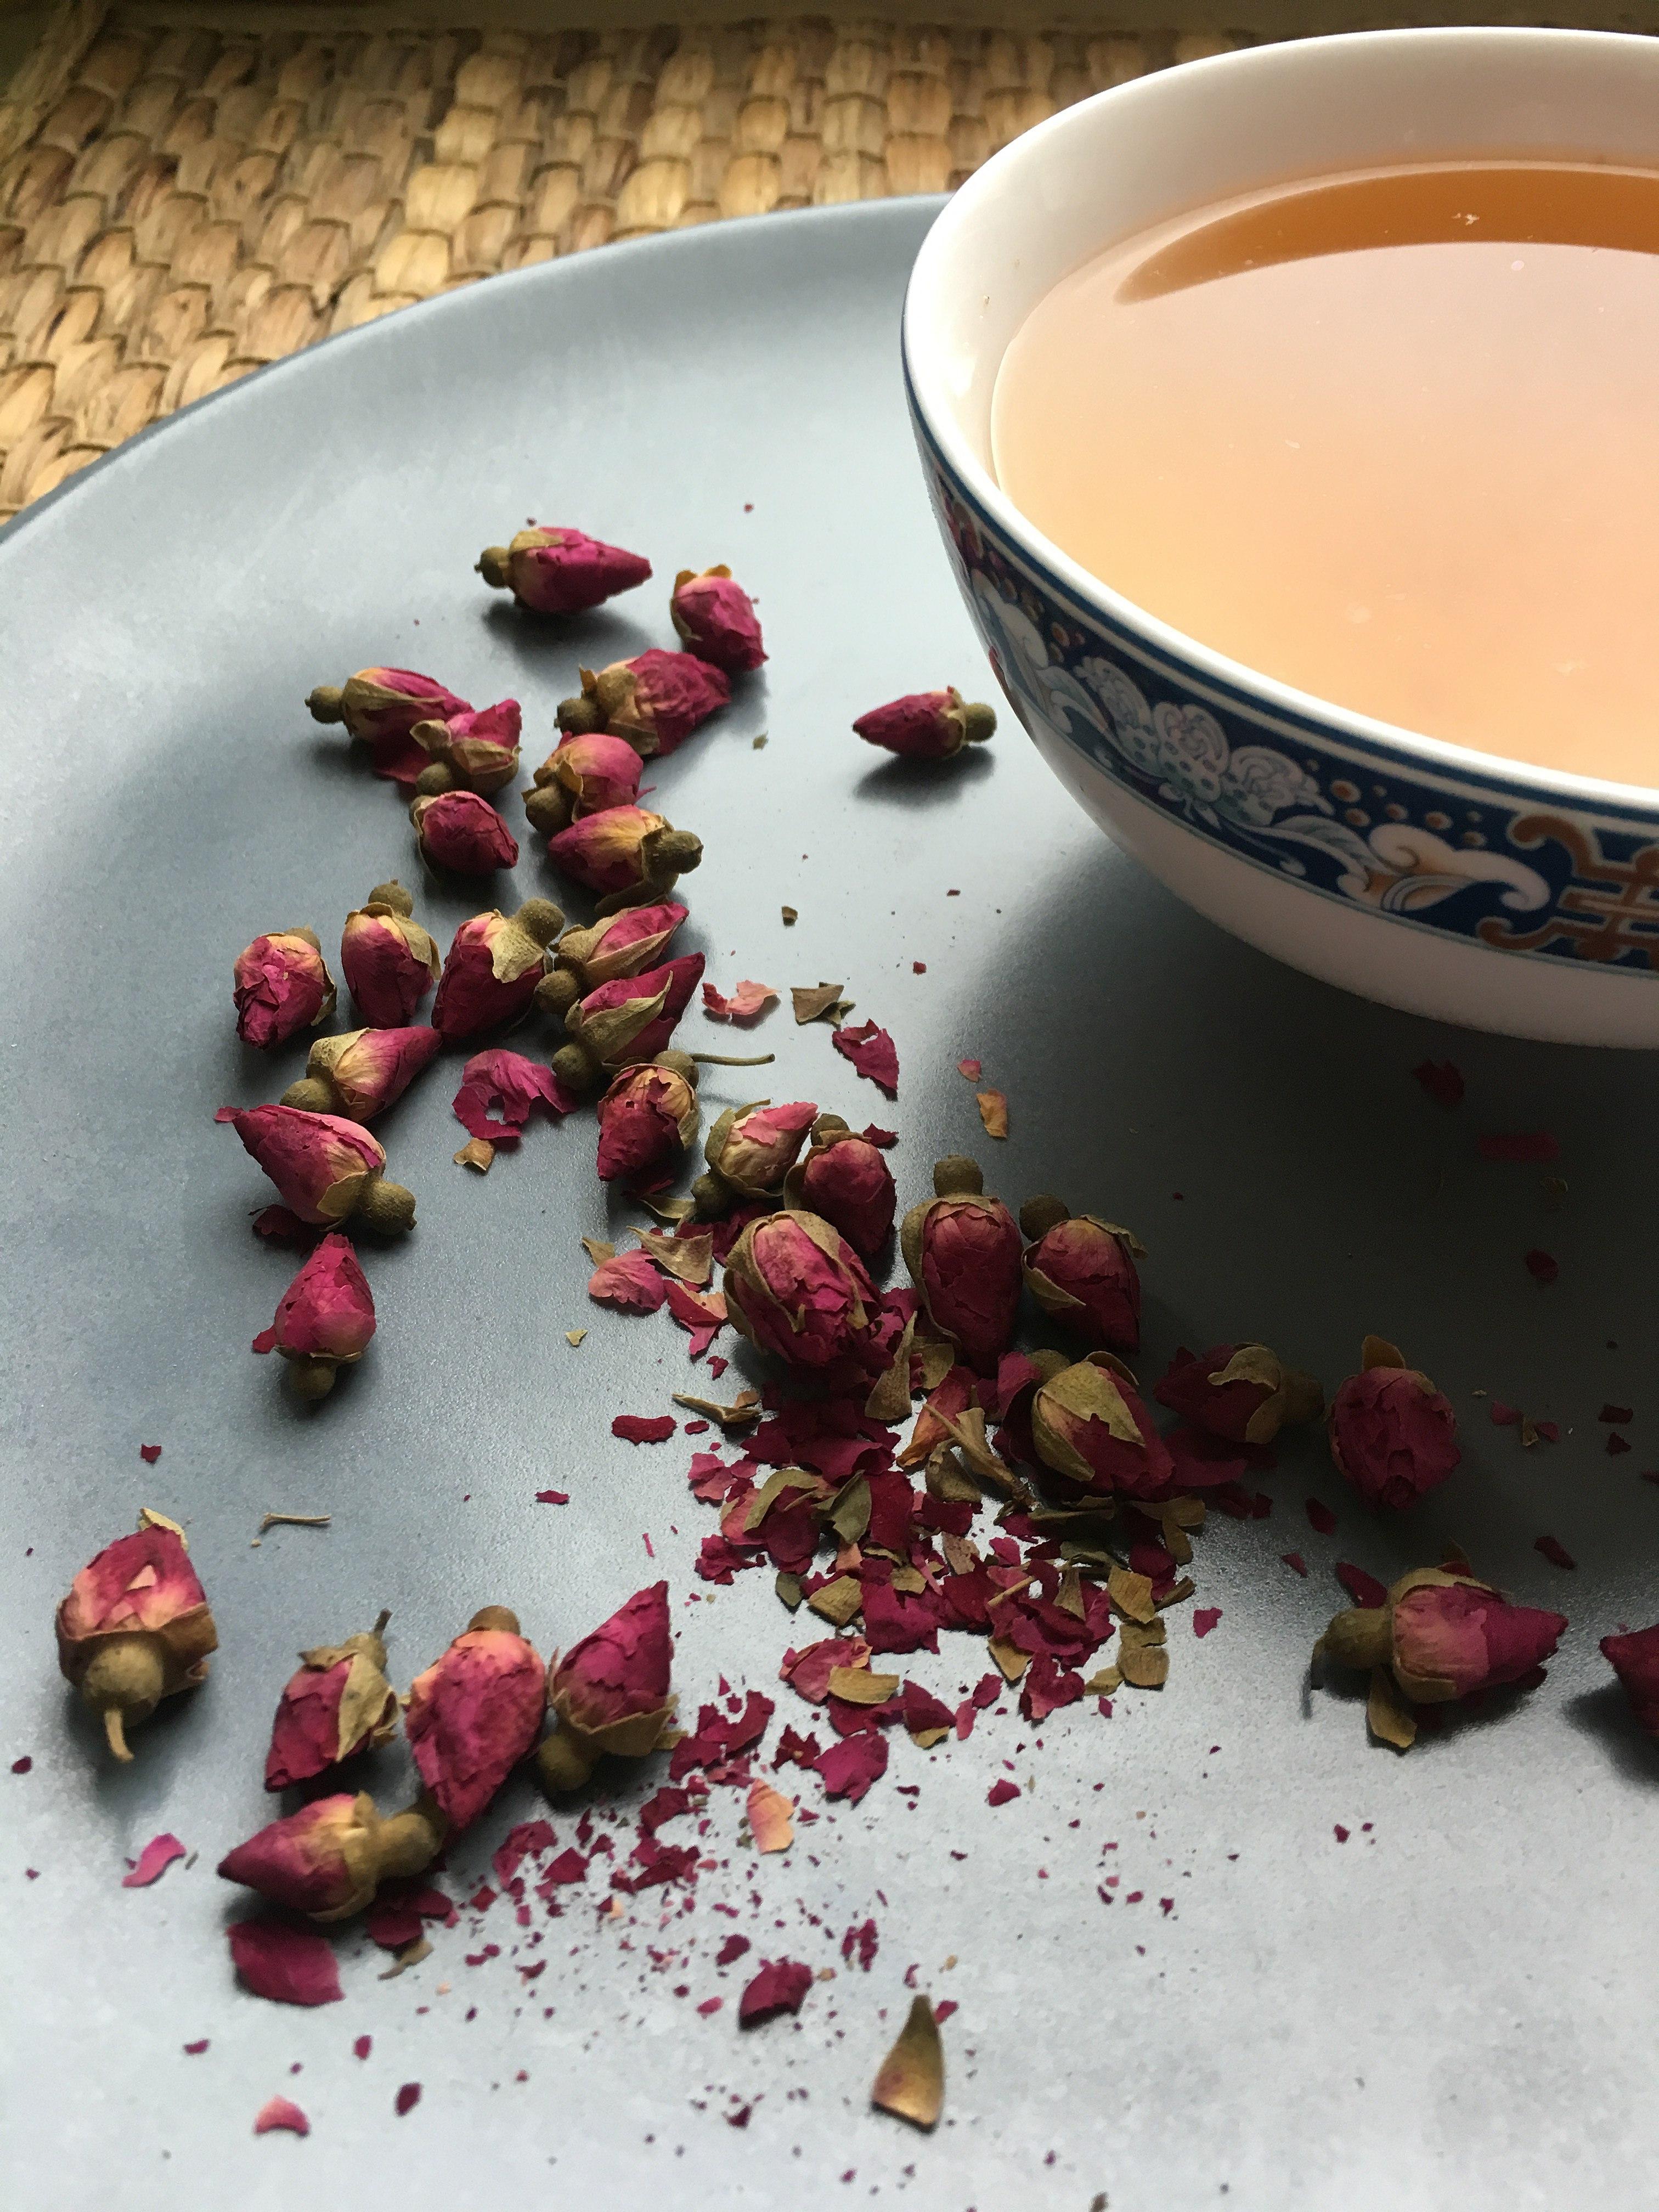 File:Cup of rosebud tea.jpg - Wikimedia Commons